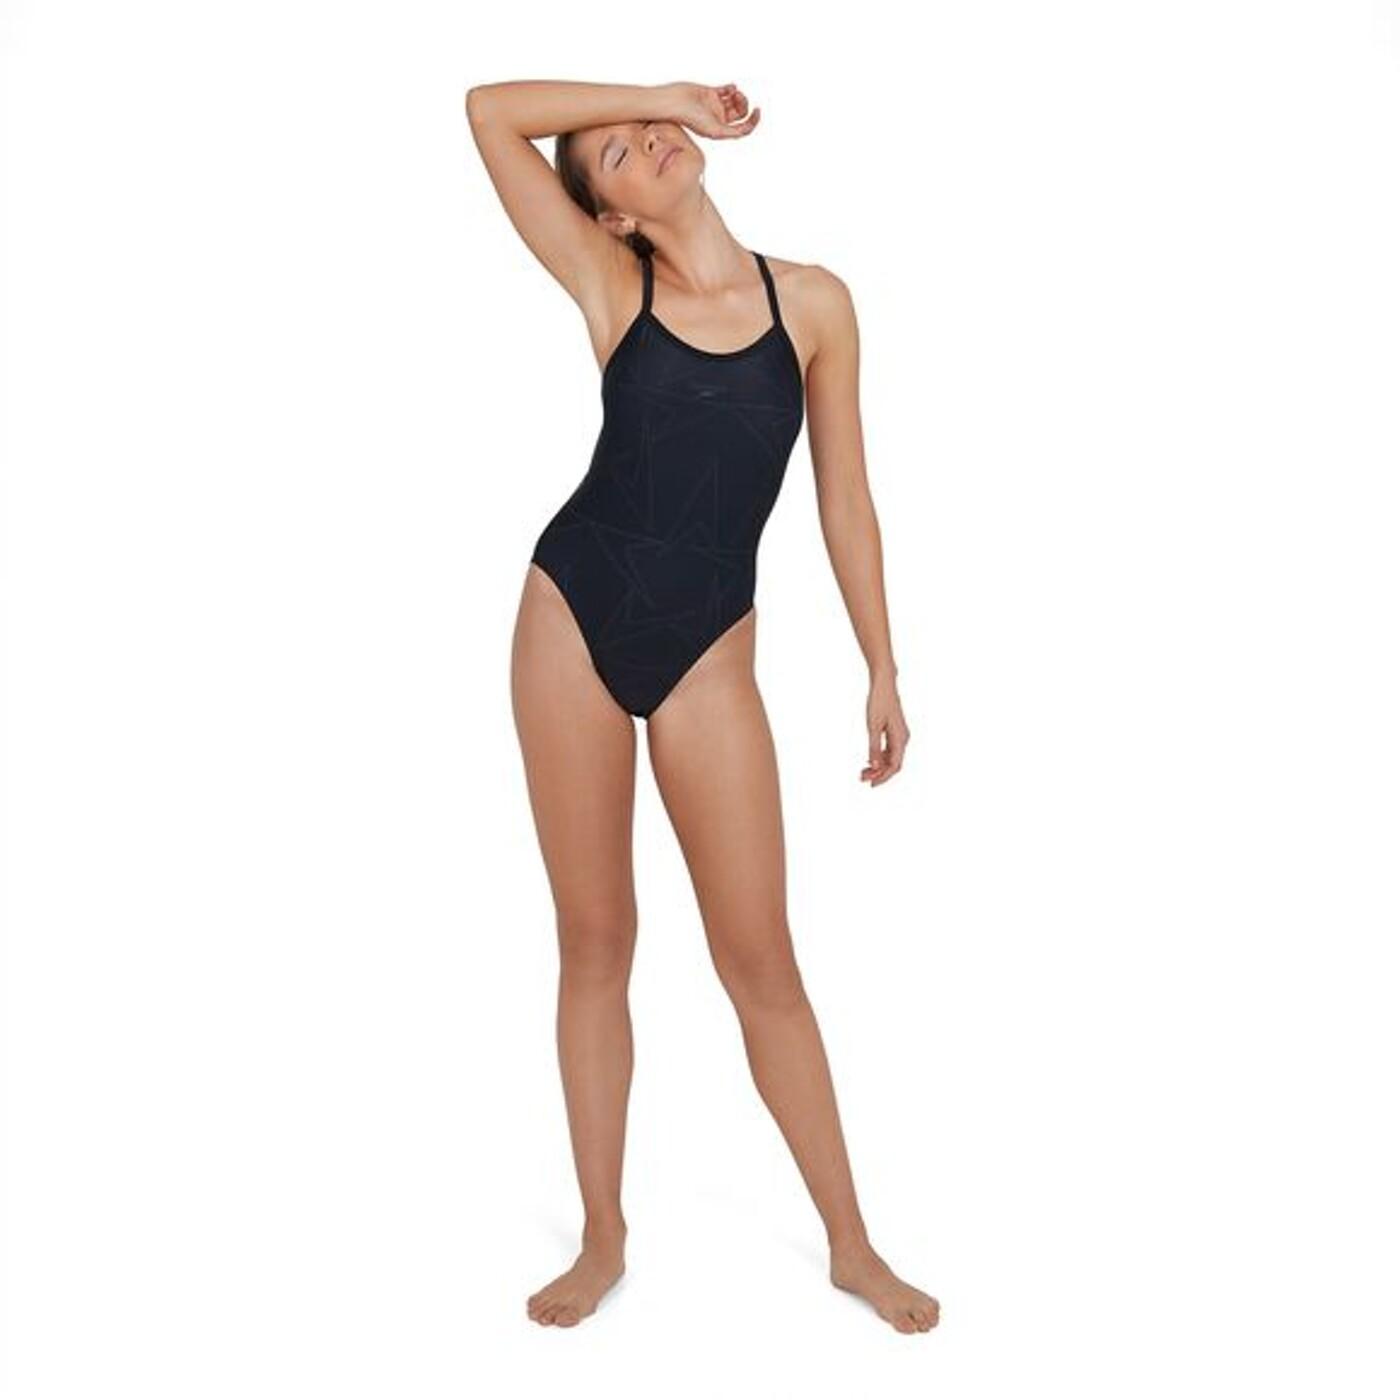 SPEEDO Boomstar Turnback Swimsuit - Damen